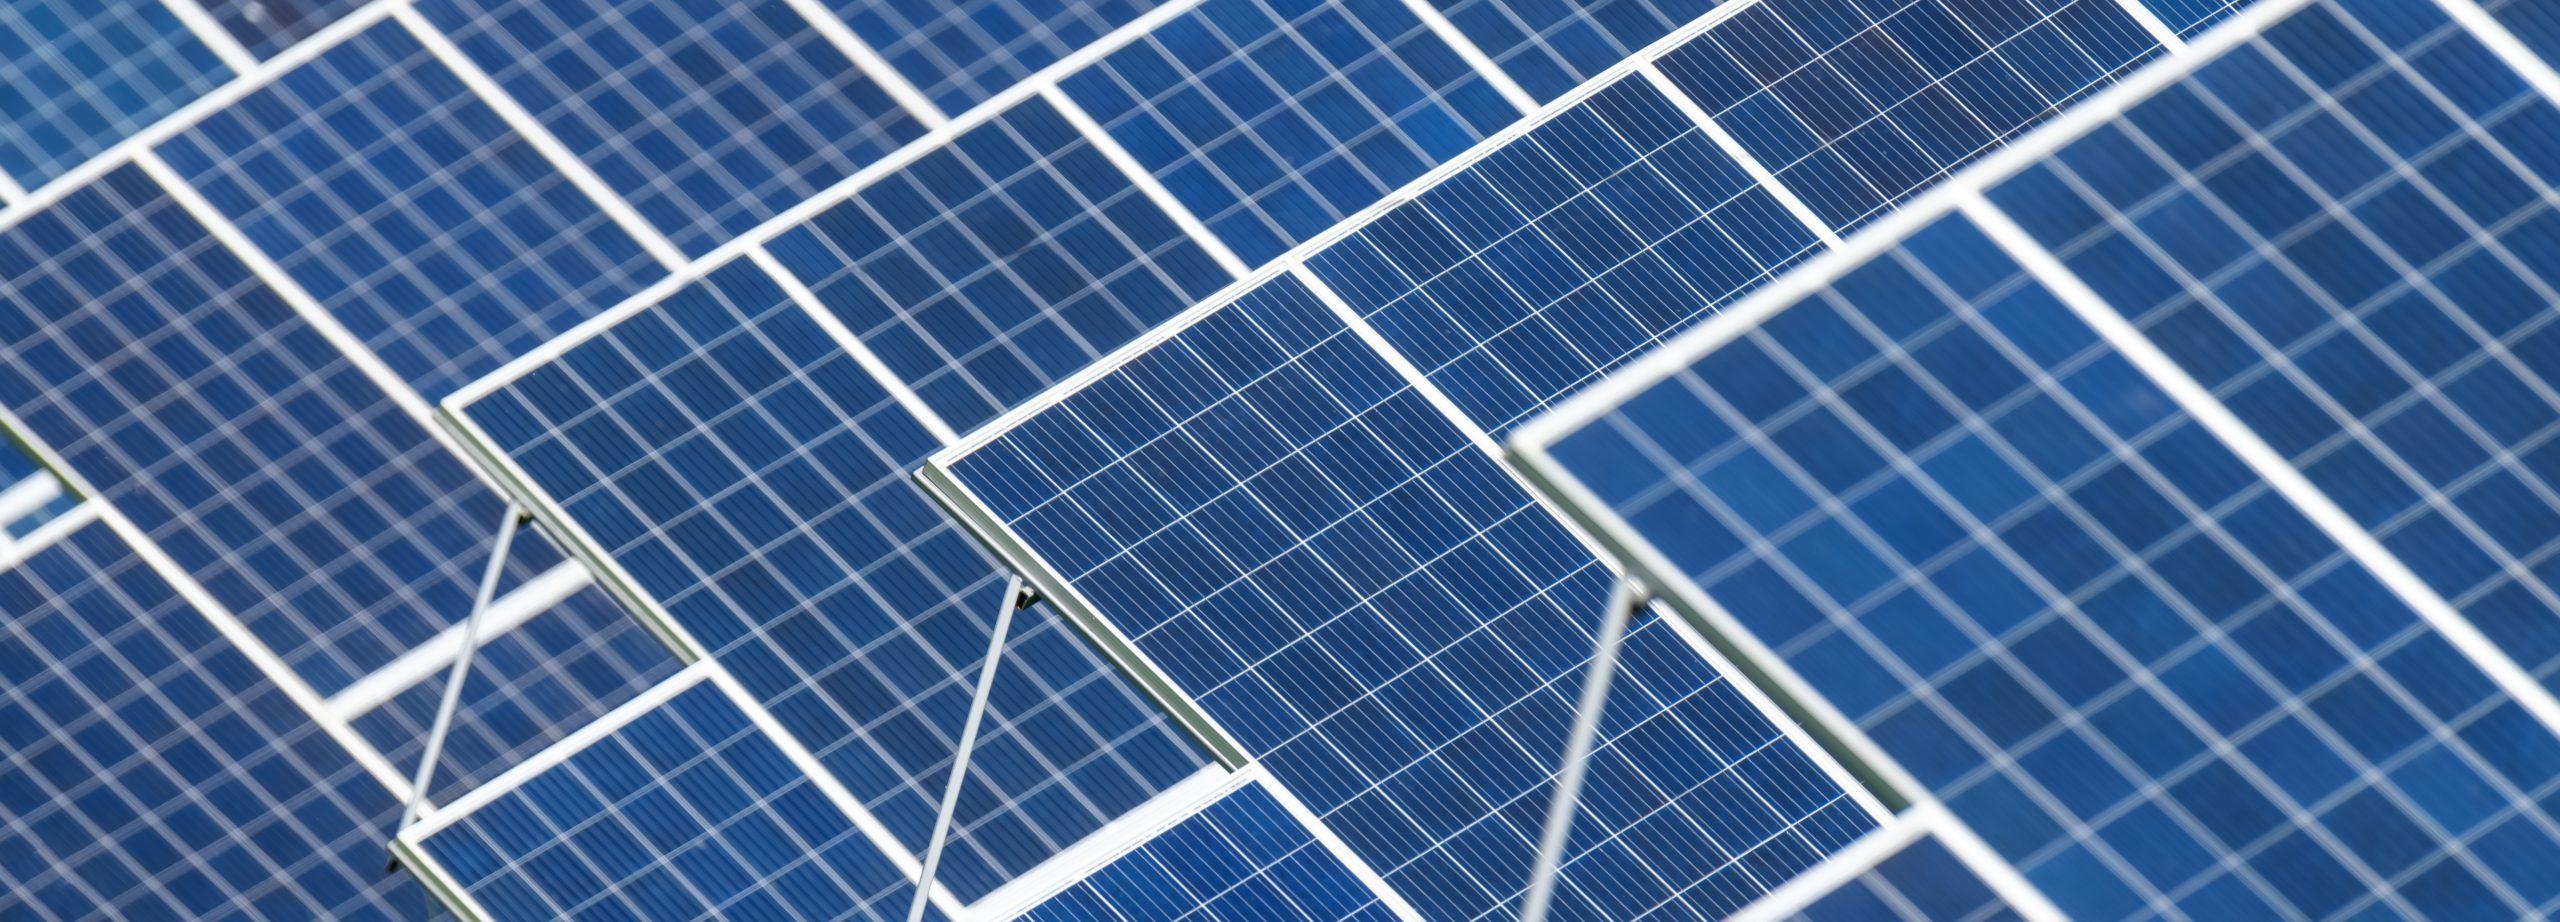 texture-solar-panels-generate-power-energy-J9CZEQM-scaled.jpg